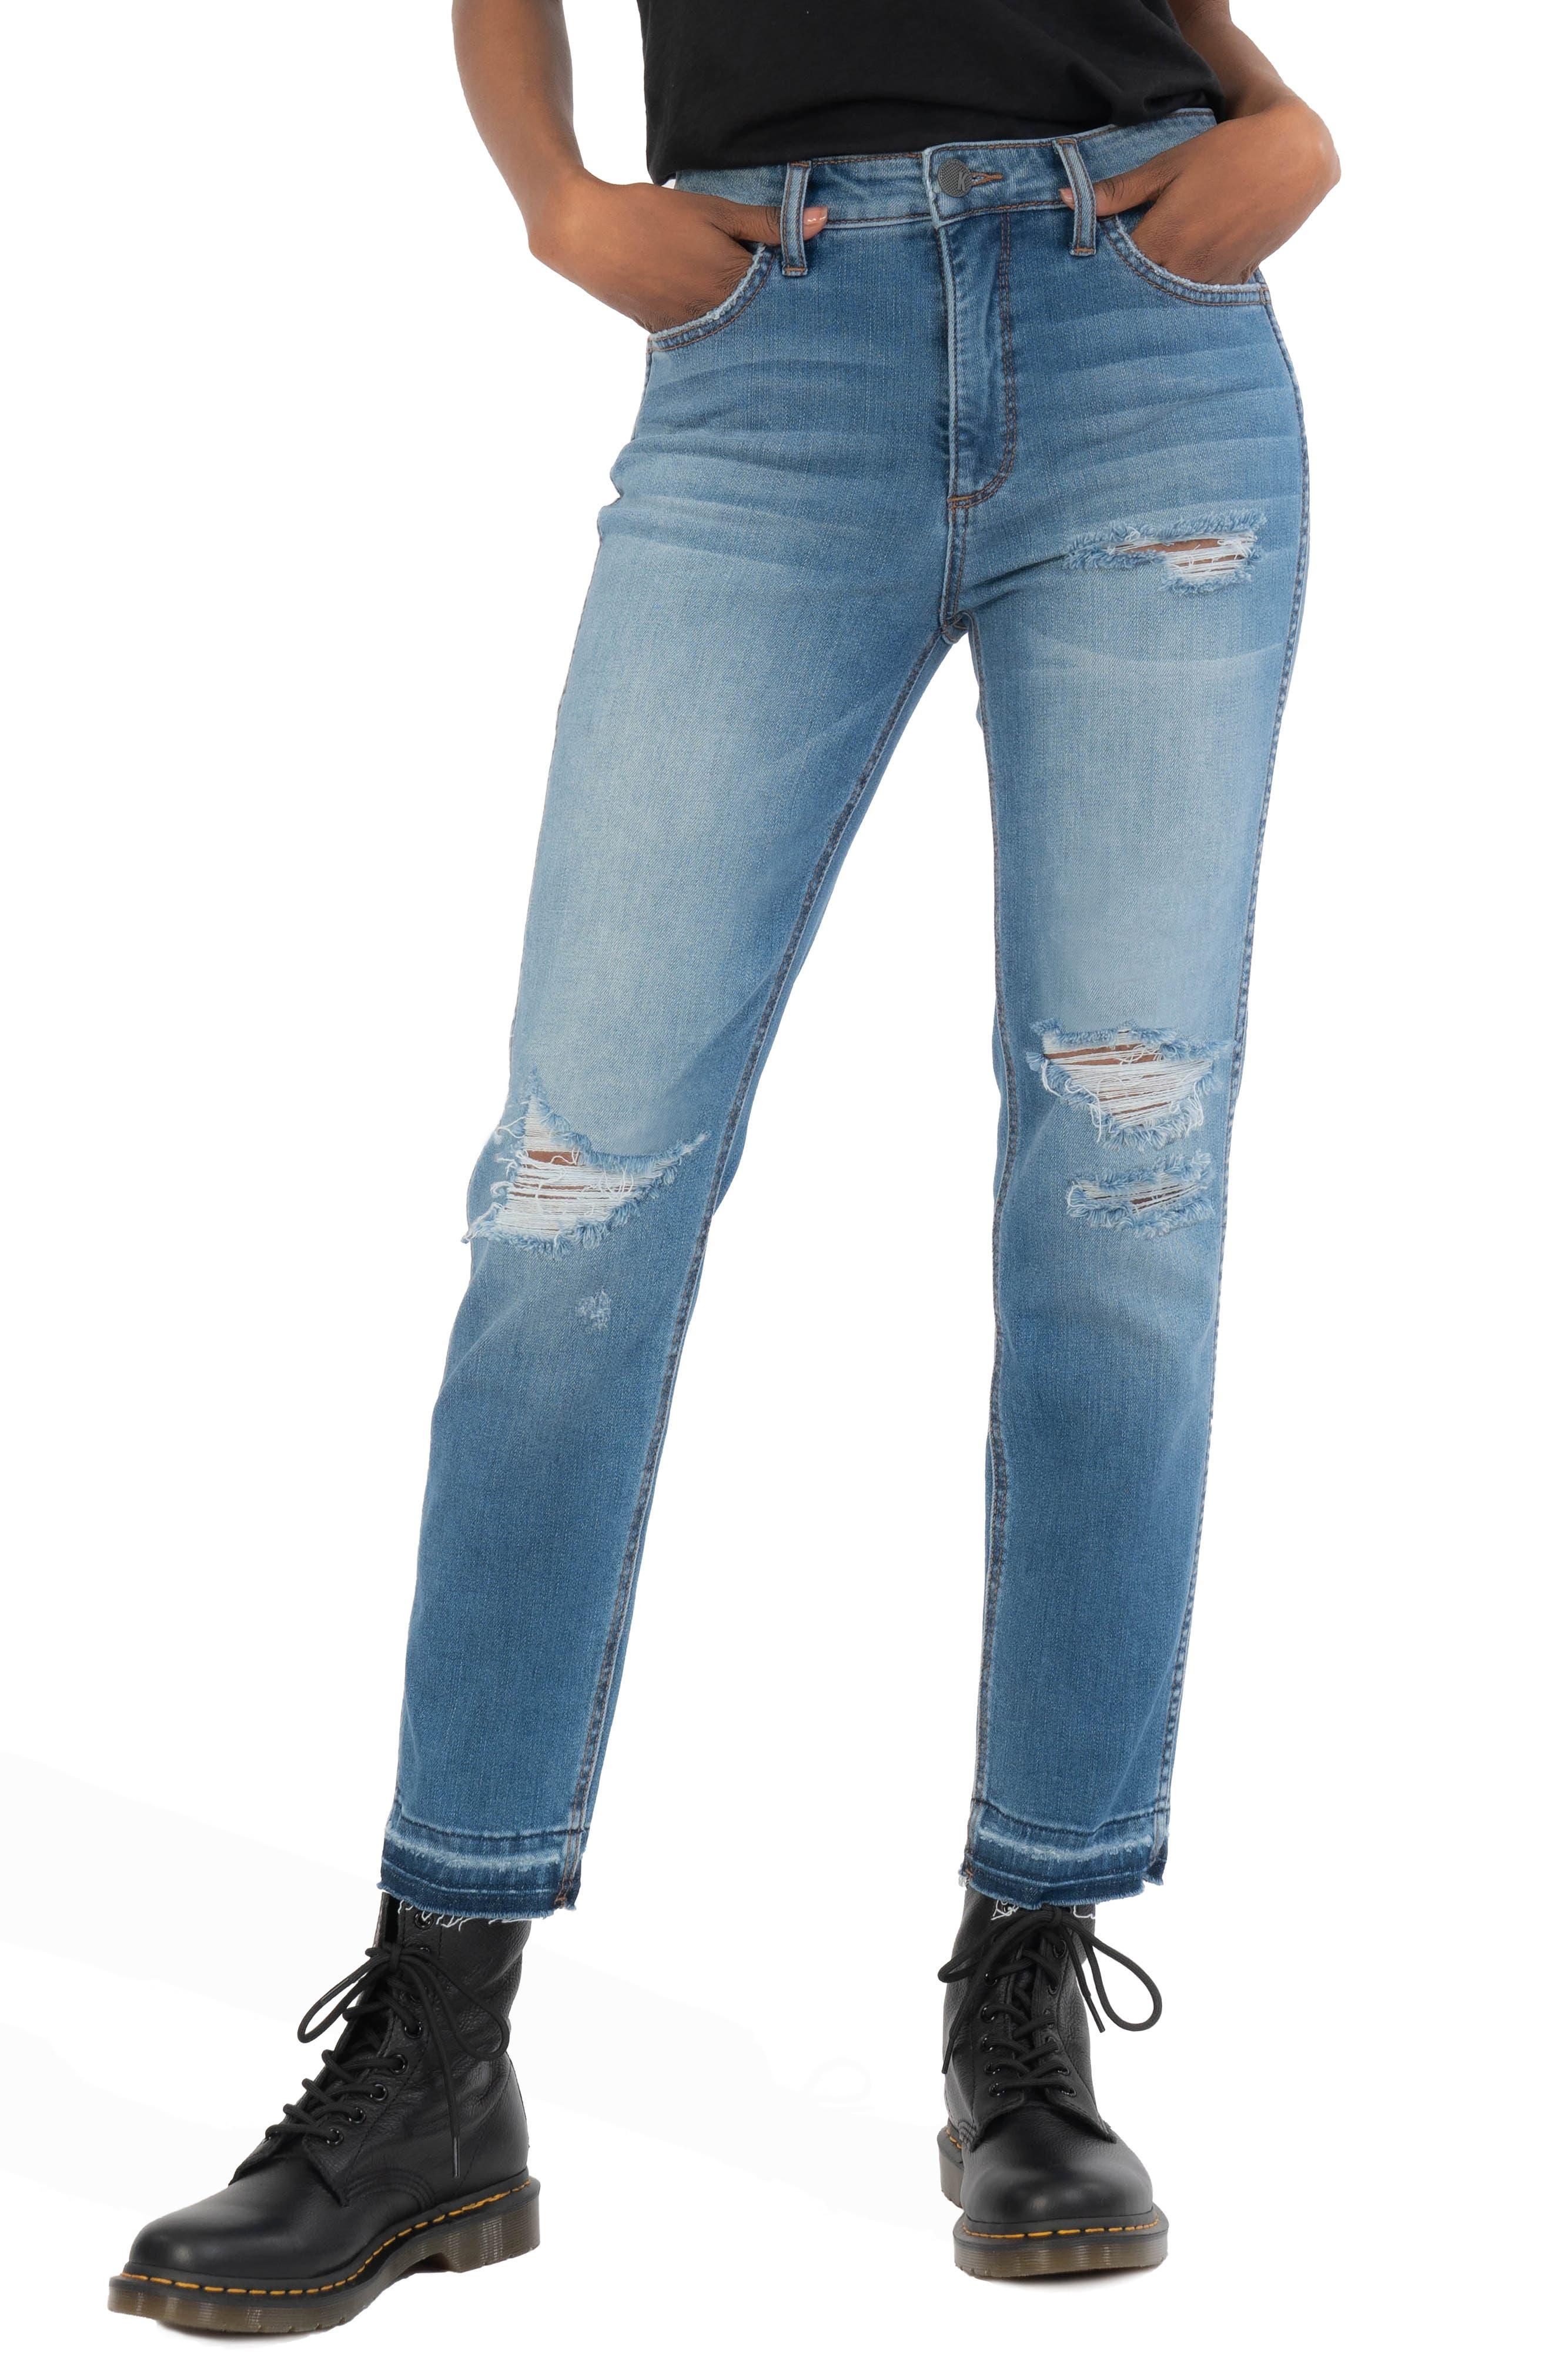 Naomi Fab Ab Ripped High Waist Crop Slim Straight Leg Jeans